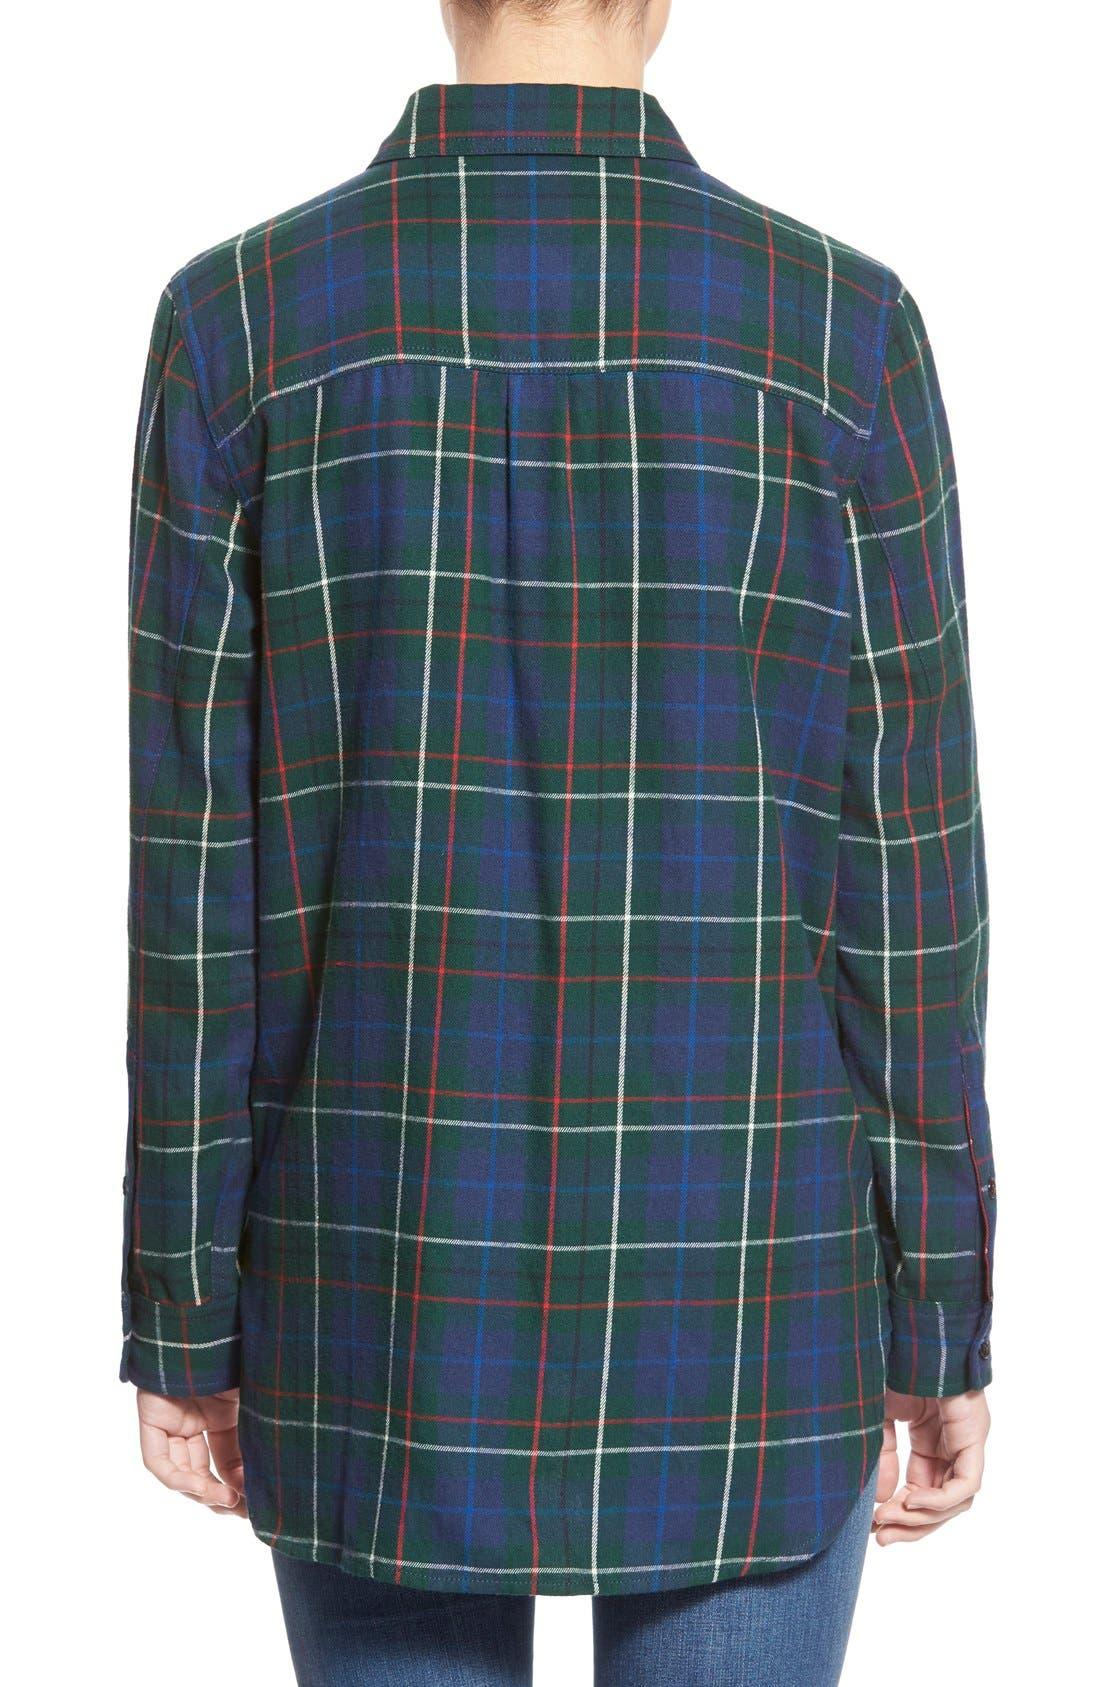 Ex Boyfriend - Ontario Plaid Flannel Shirt,                             Alternate thumbnail 2, color,                             300